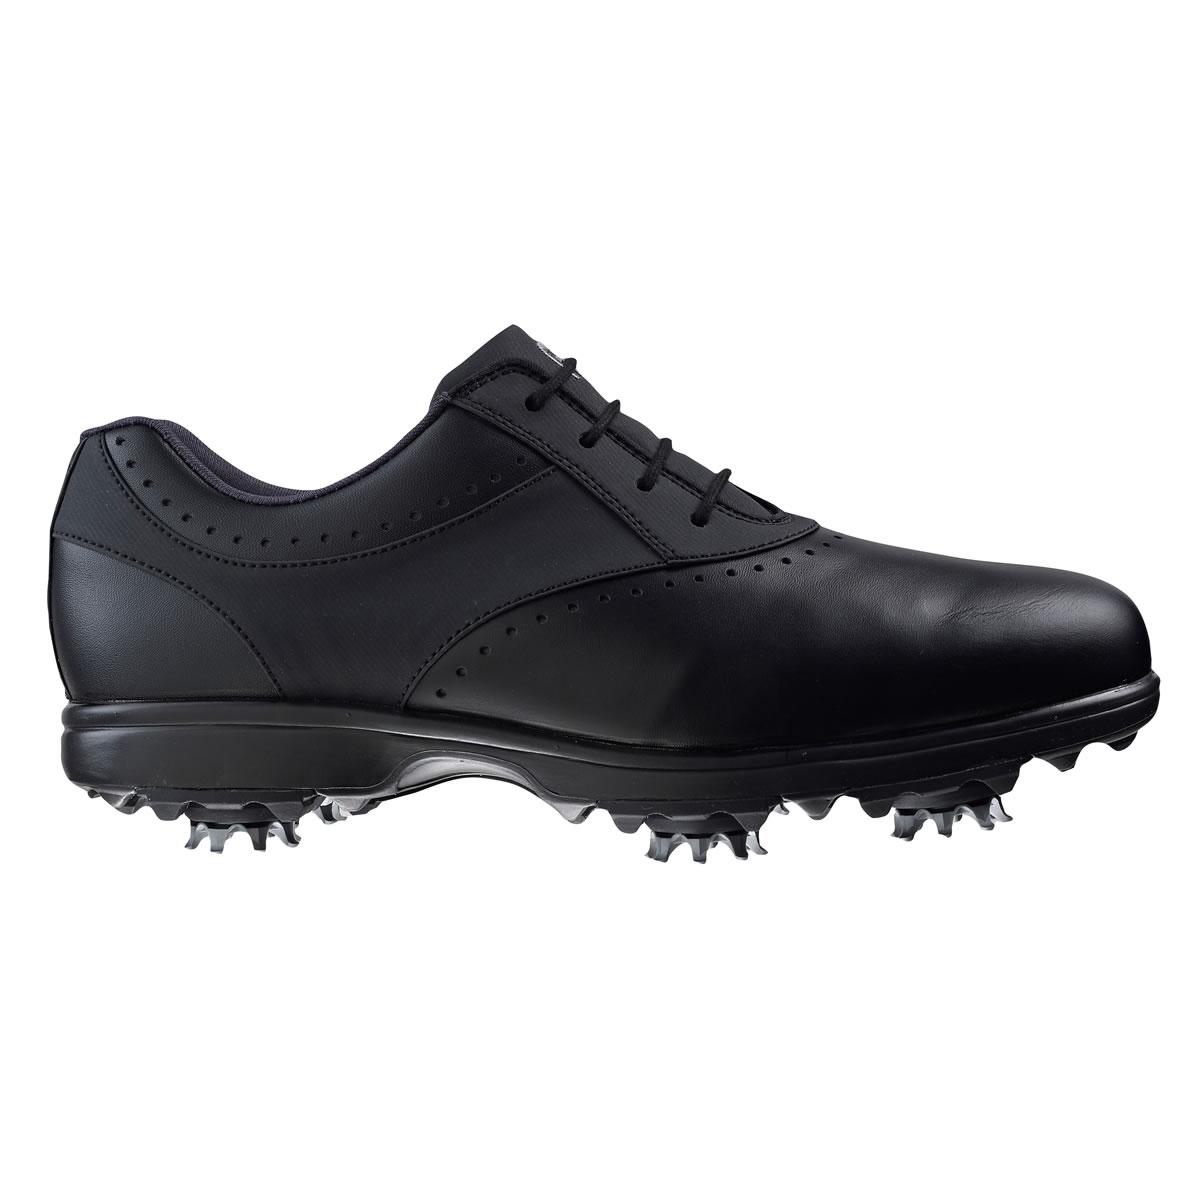 Footjoy Emerge Ladies Golf Shoes